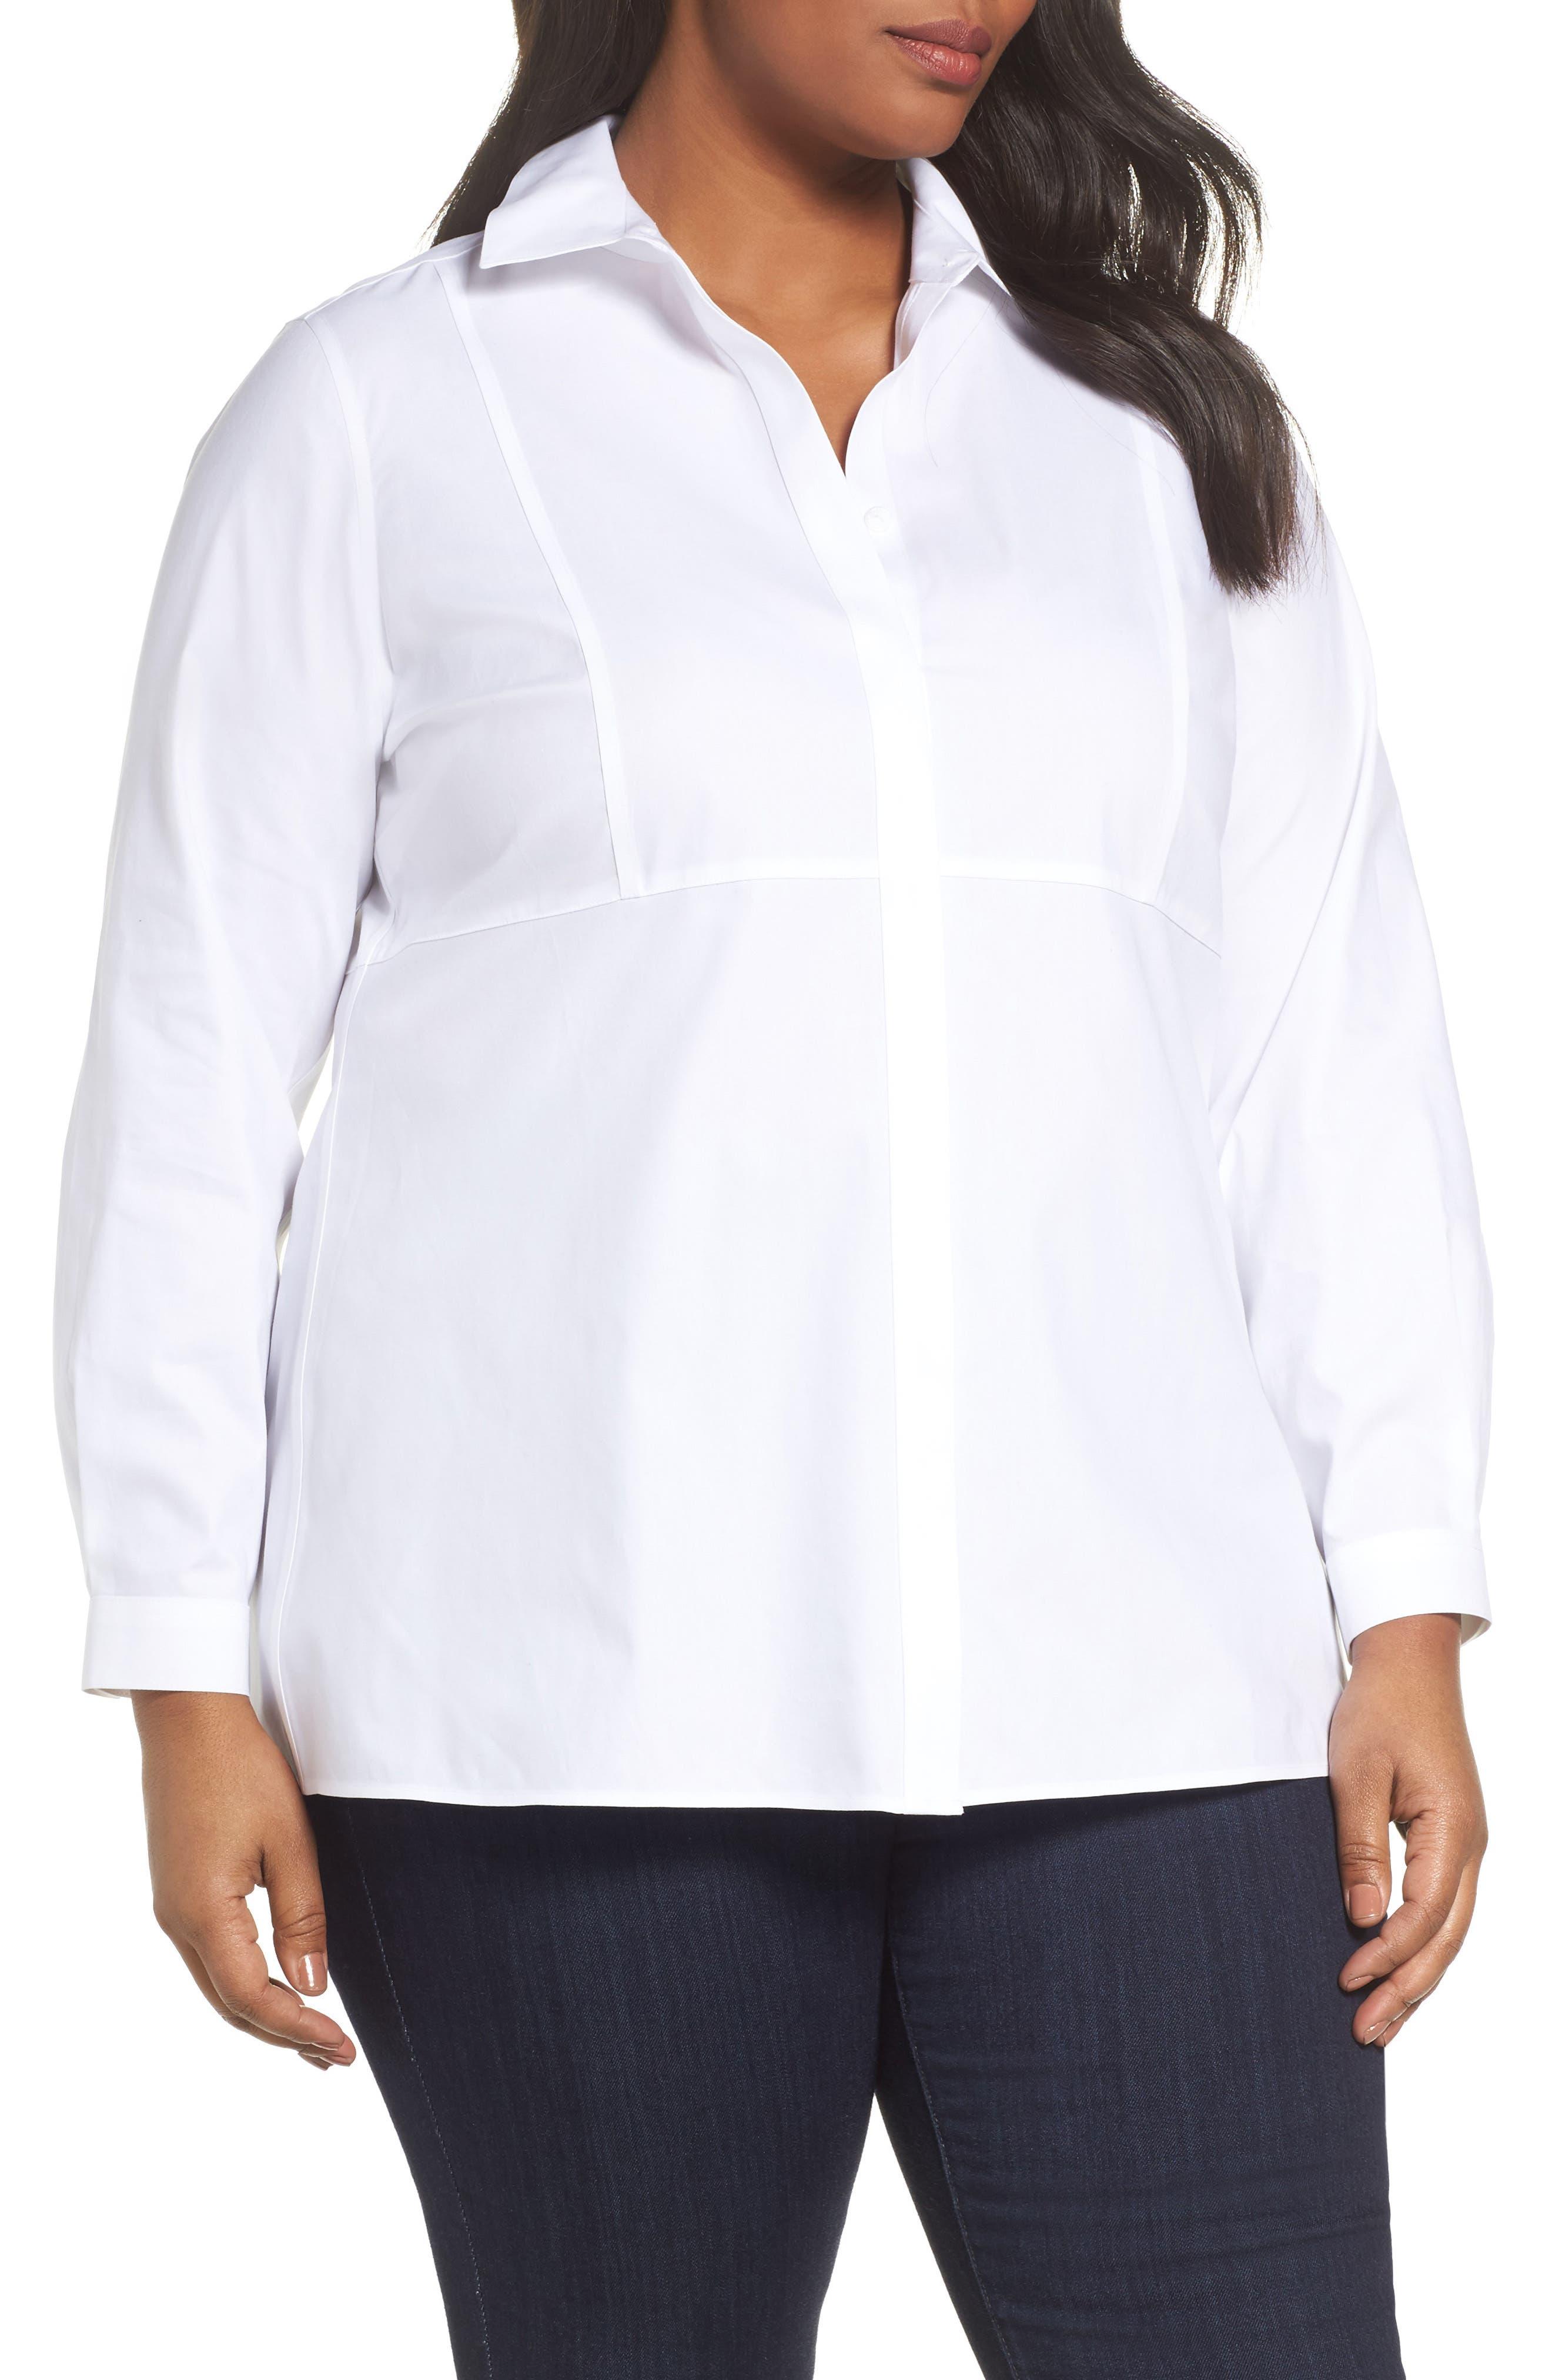 Main Image - Foxcroft Pinpoint Oxford Cloth Shirt (Plus Size)